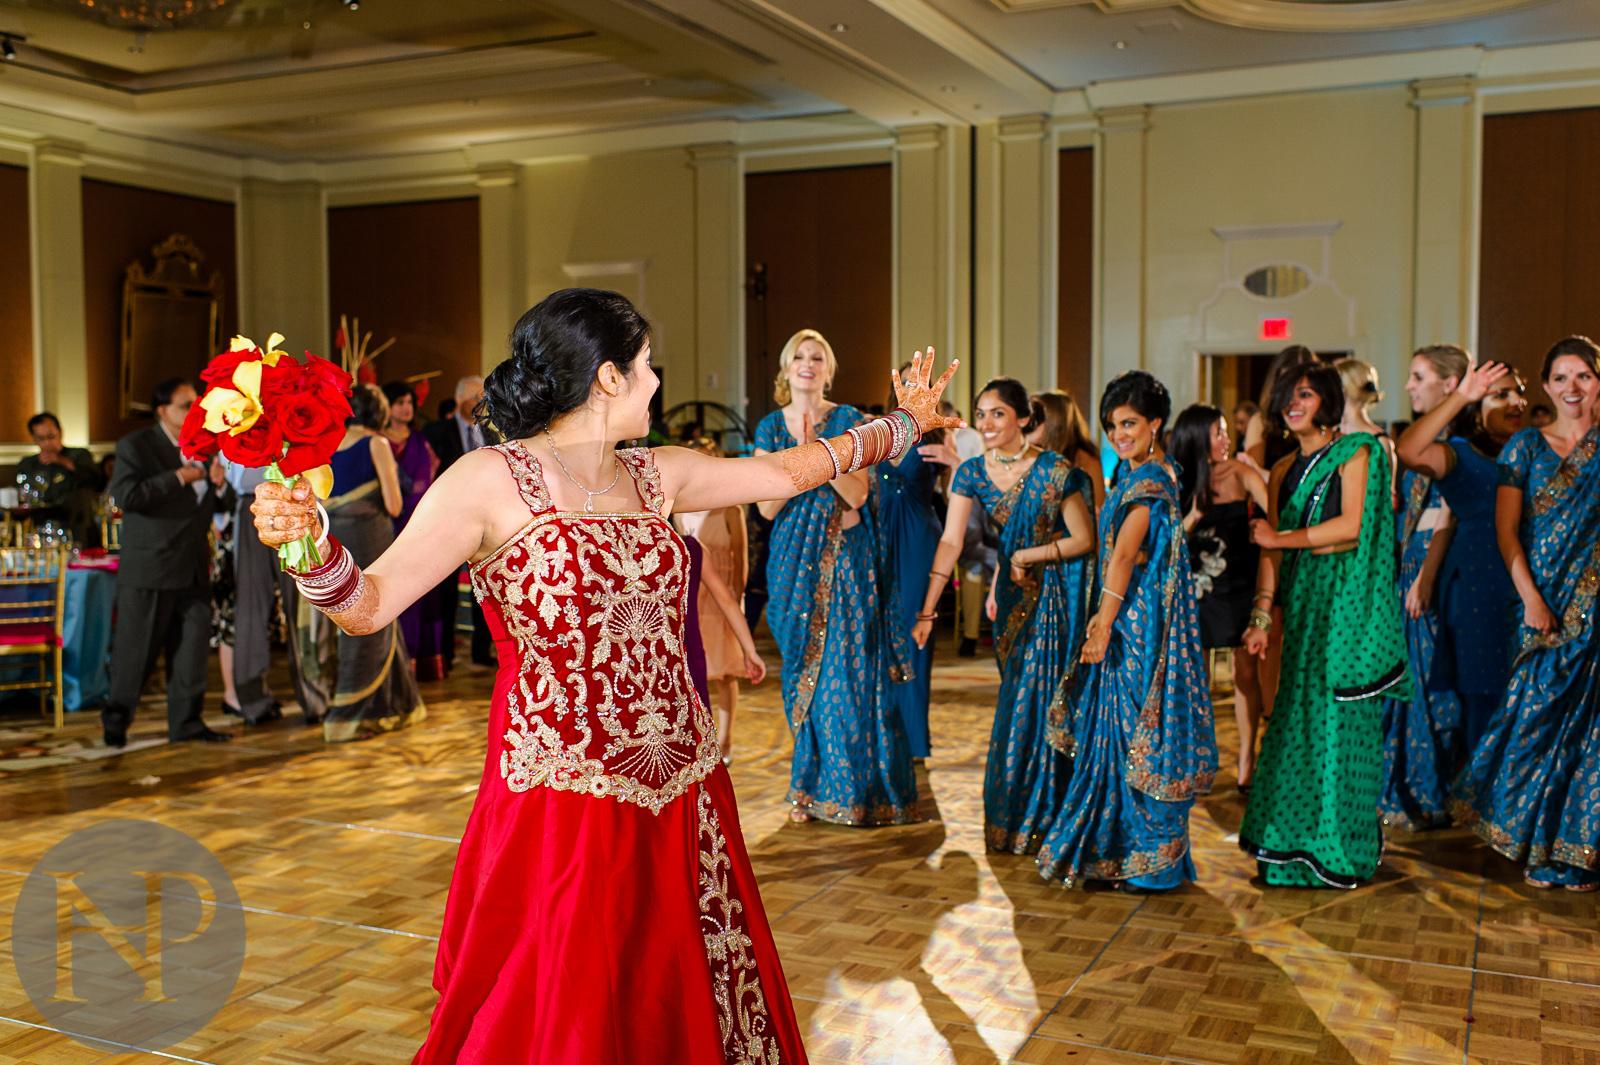 washington dc music photographer noah hayes georgetown dc va md alexandria - madarin hotel - oriental - indian - chinese - naina christopher.jpg-57.jpg